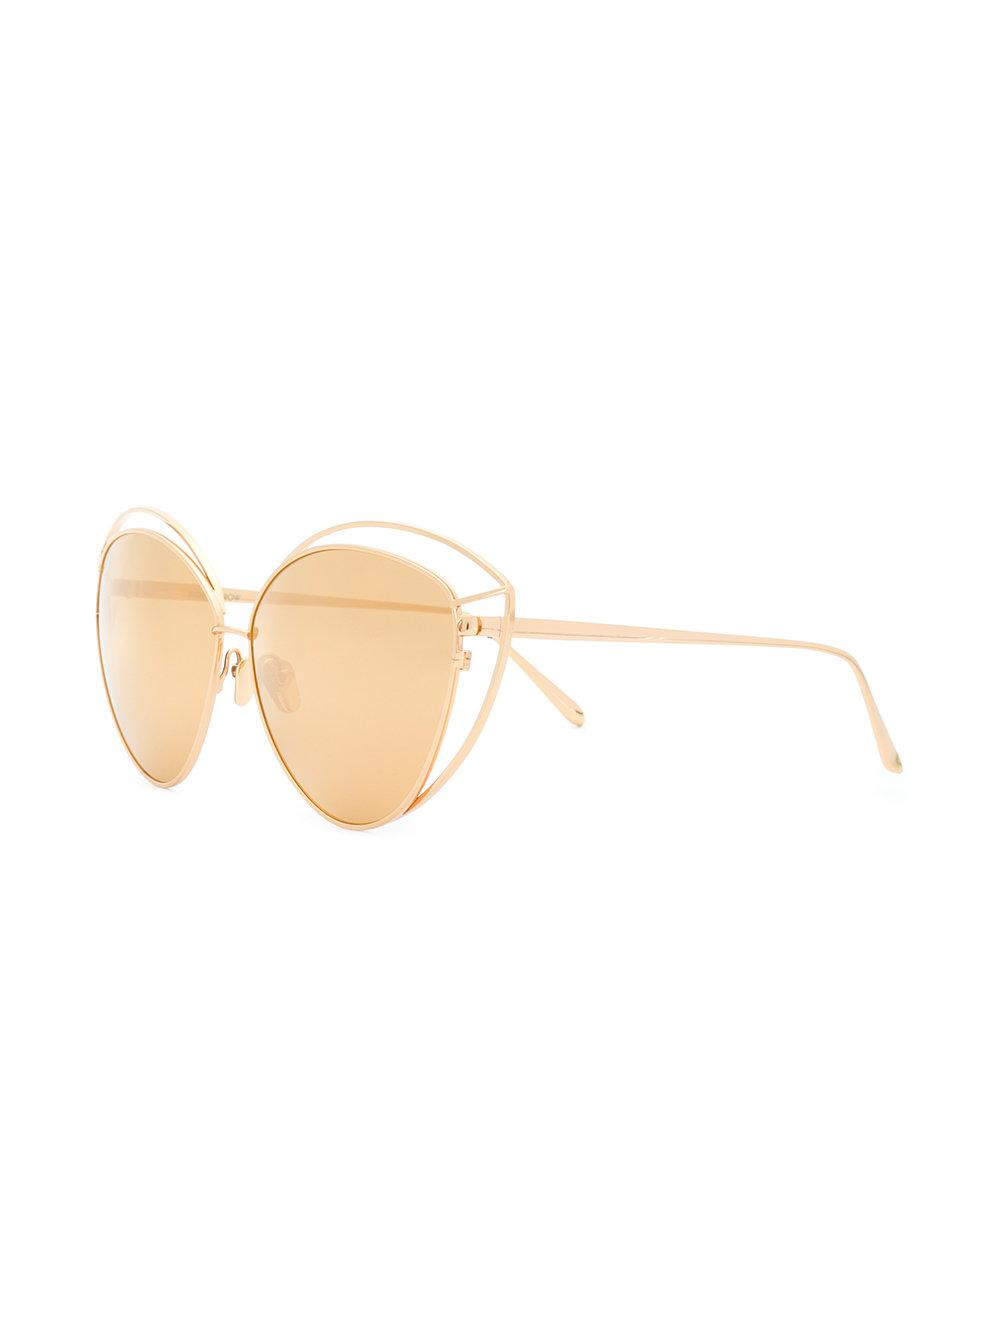 Linda Farrow Cat Eye Cutout Frame Sunglasses in Metallic